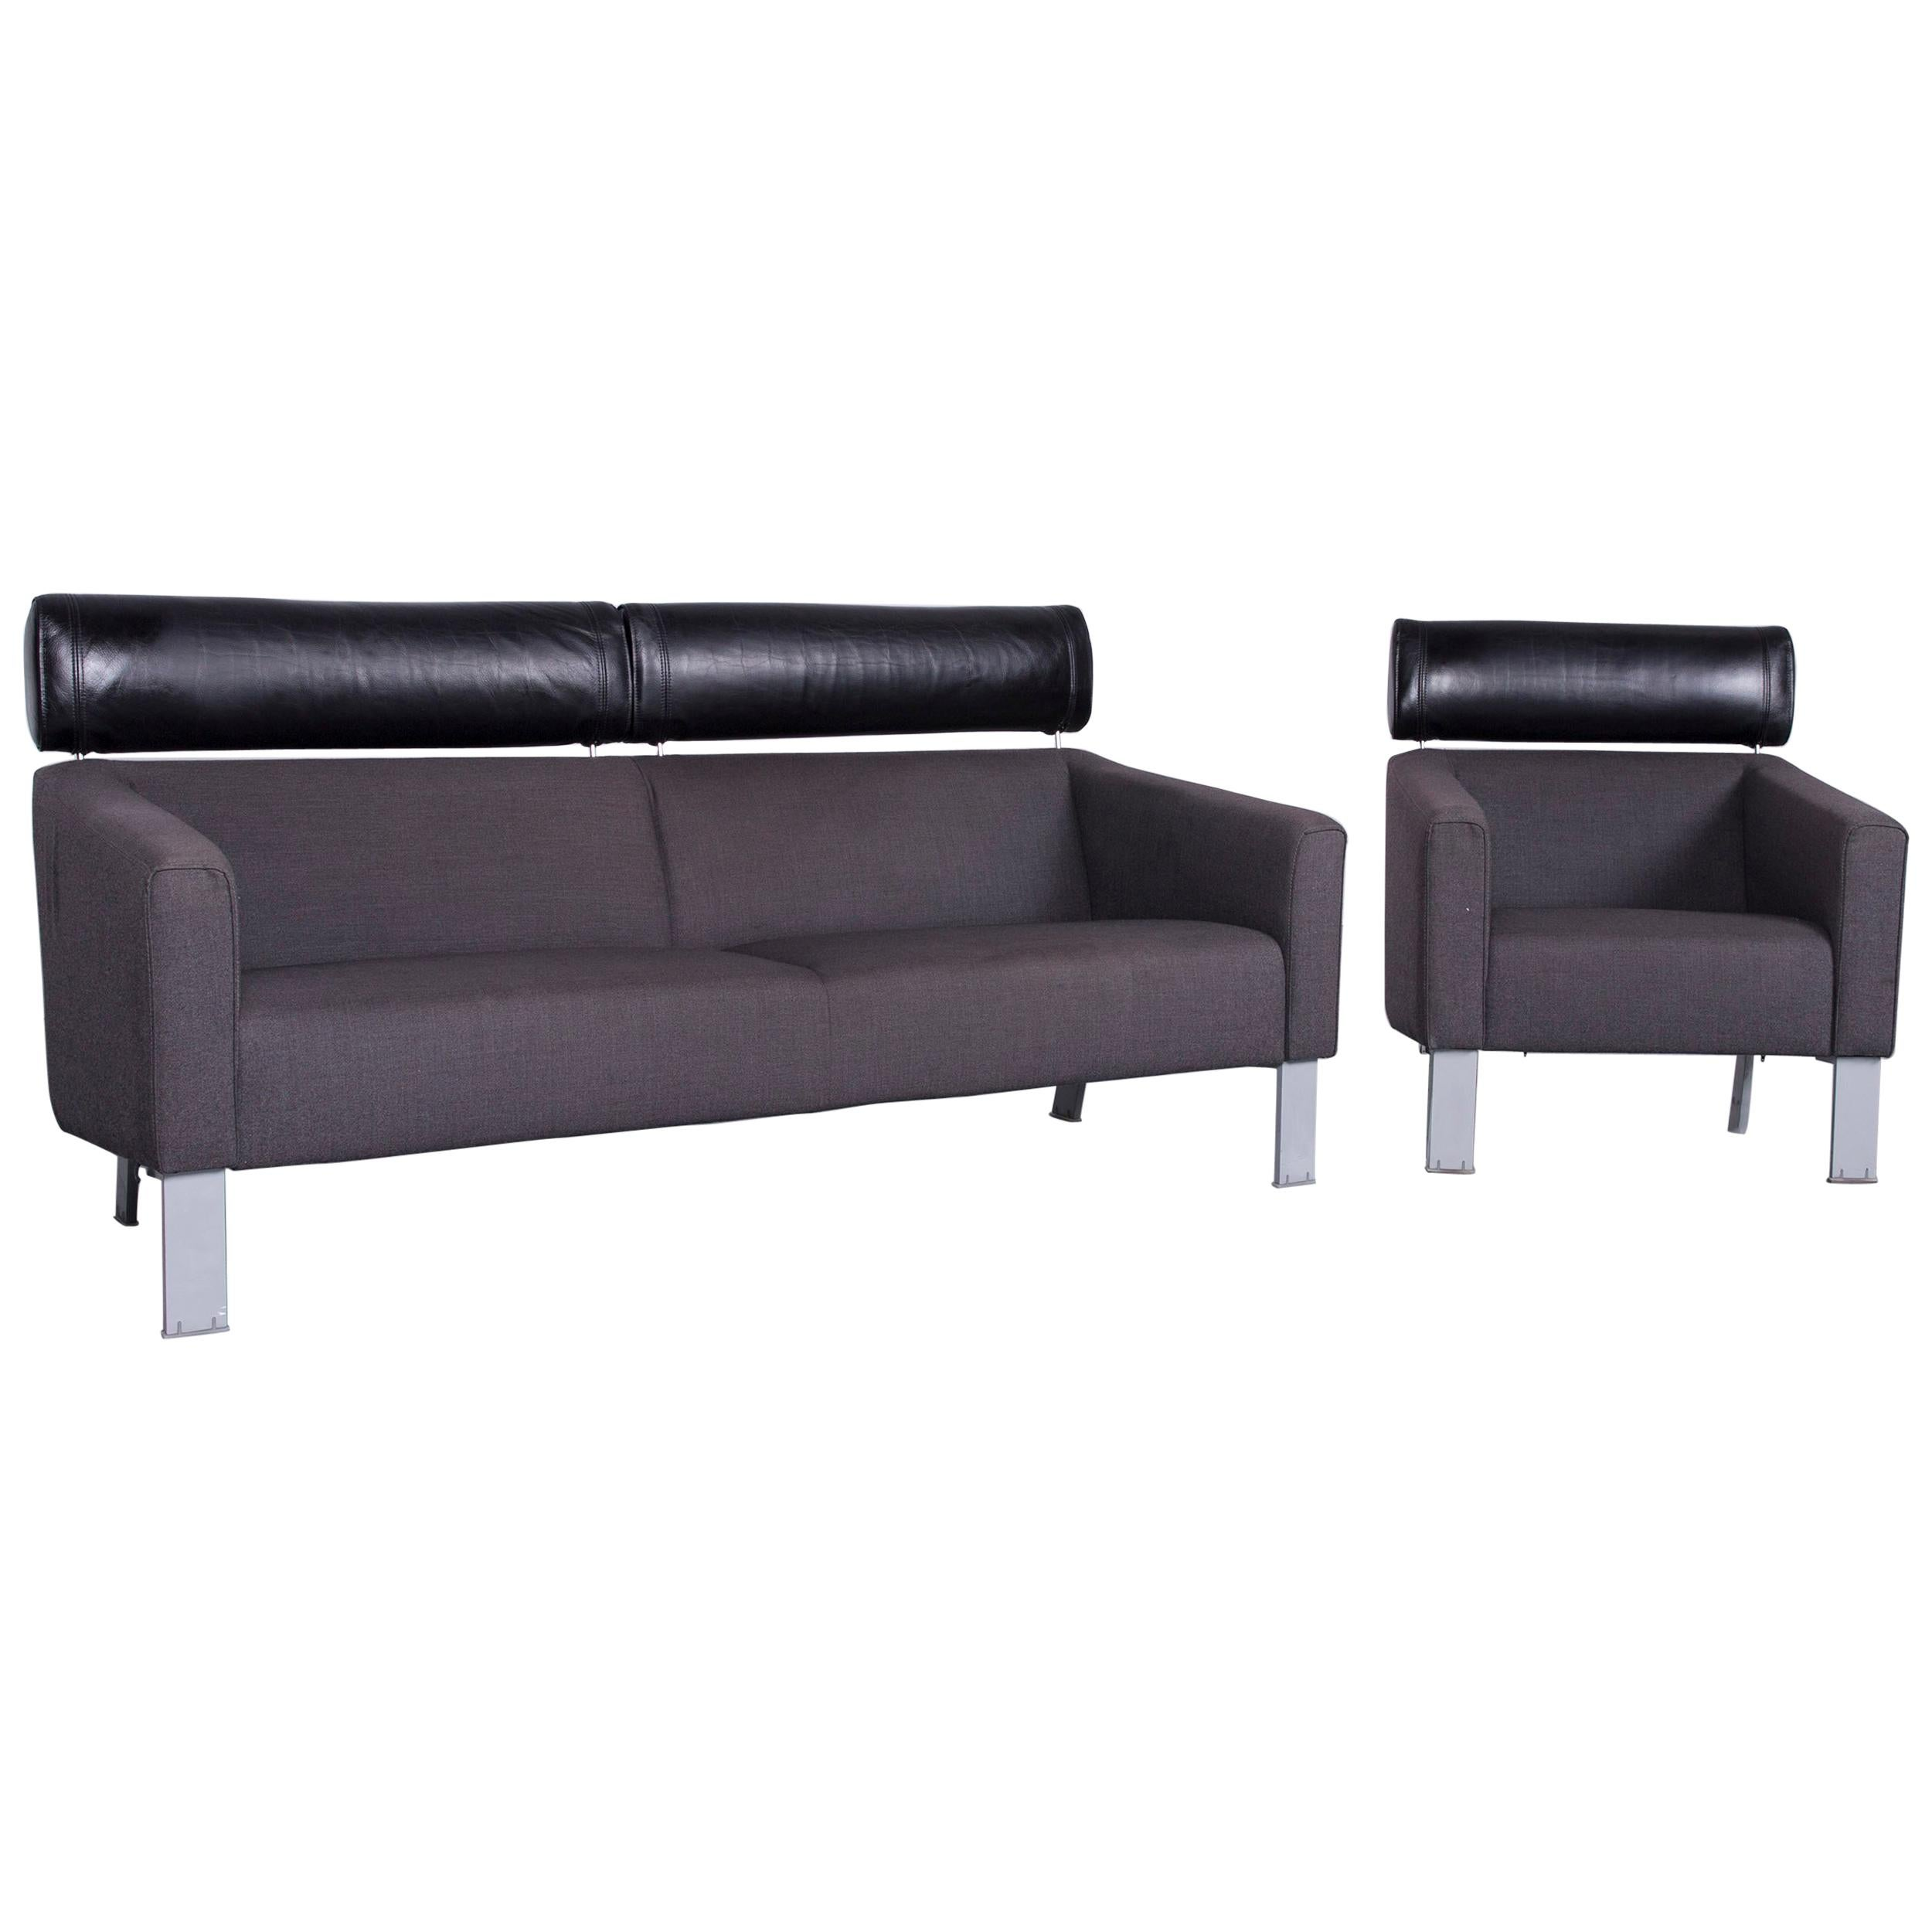 Leolux Patachou Designer Sofa Armchair Set Fabric Grey Two Seat Couch